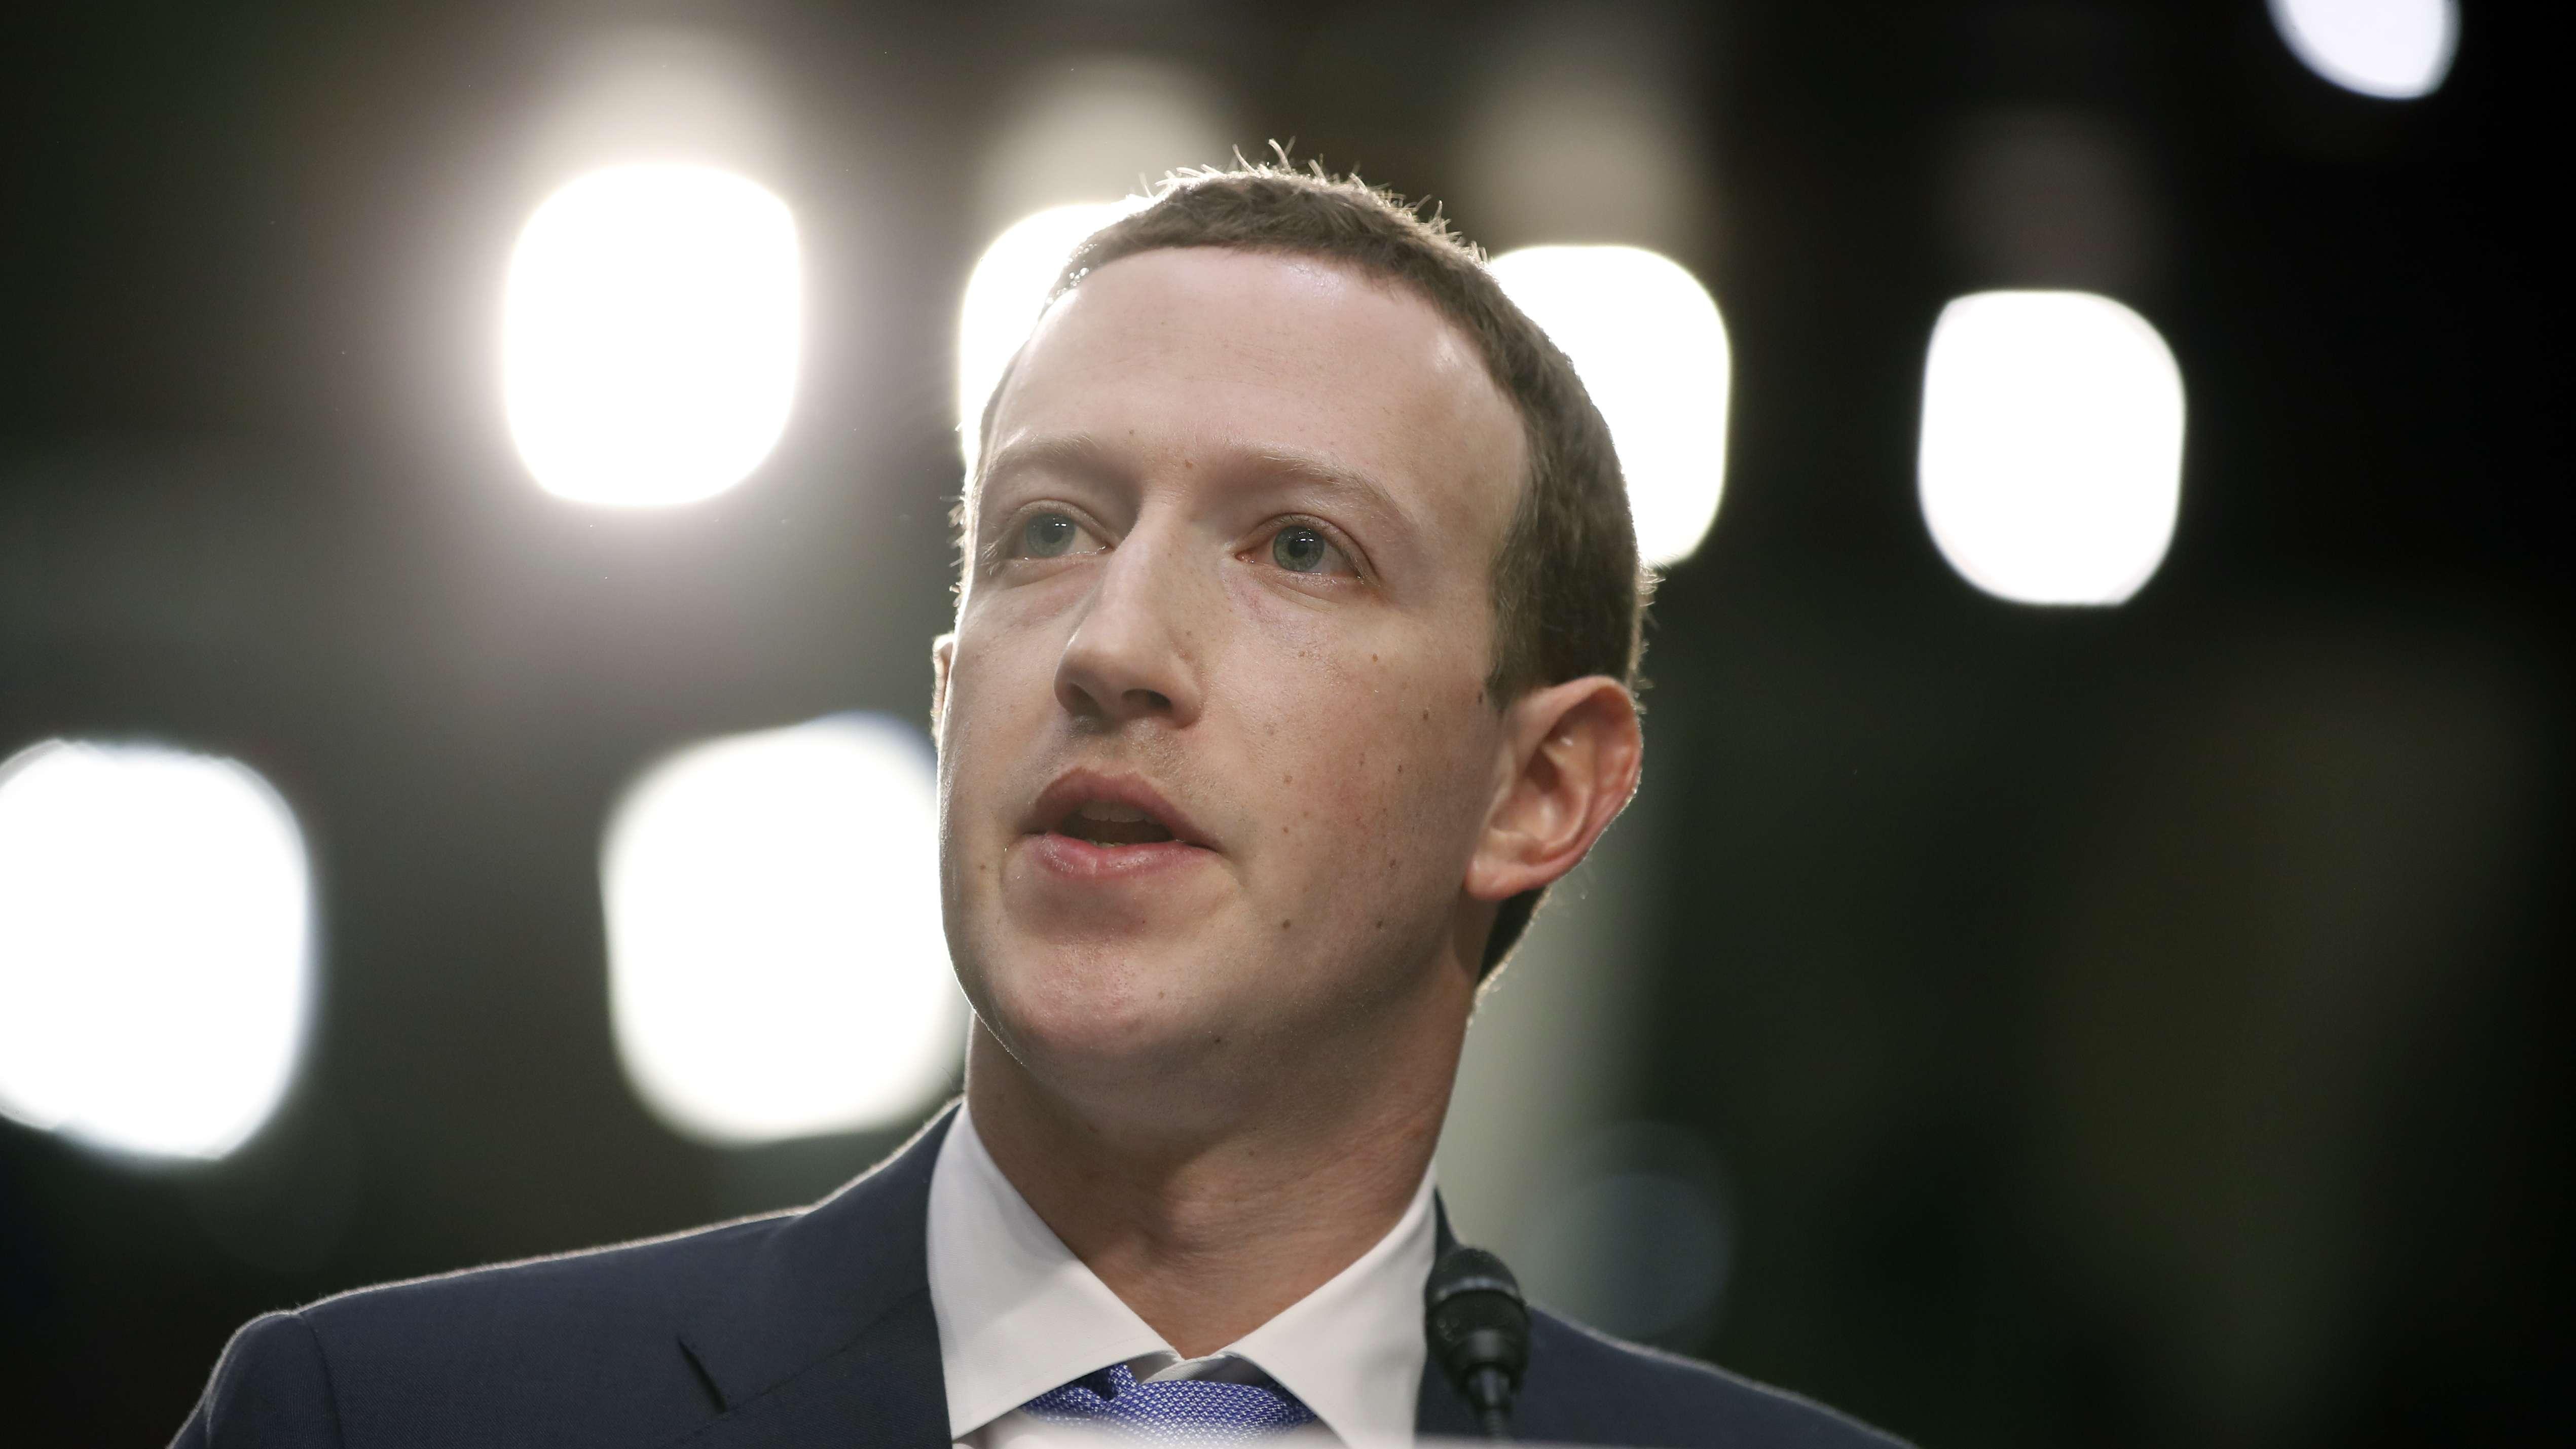 Zuckerberg in Anhörung